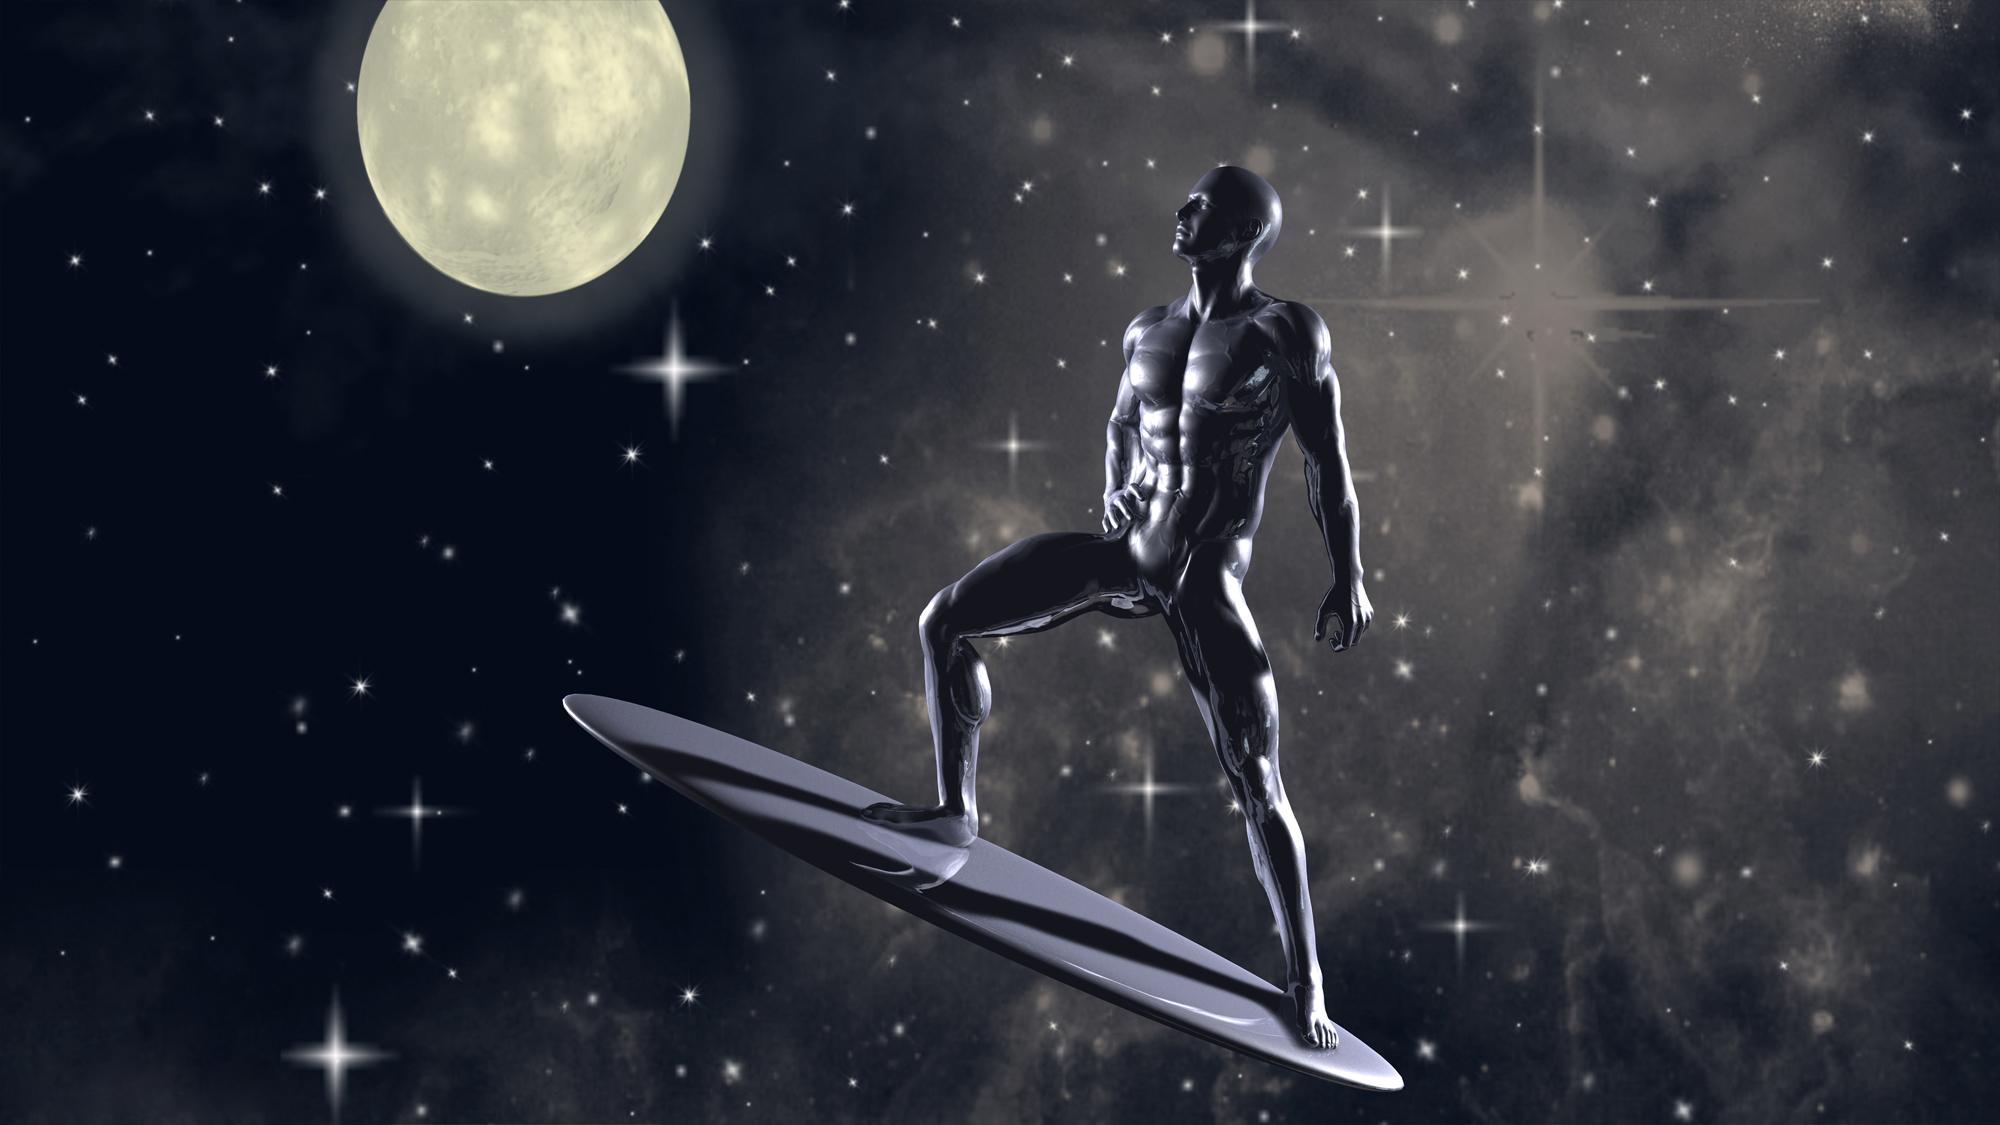 Silver Surfer Computer Wallpapers Desktop Backgrounds